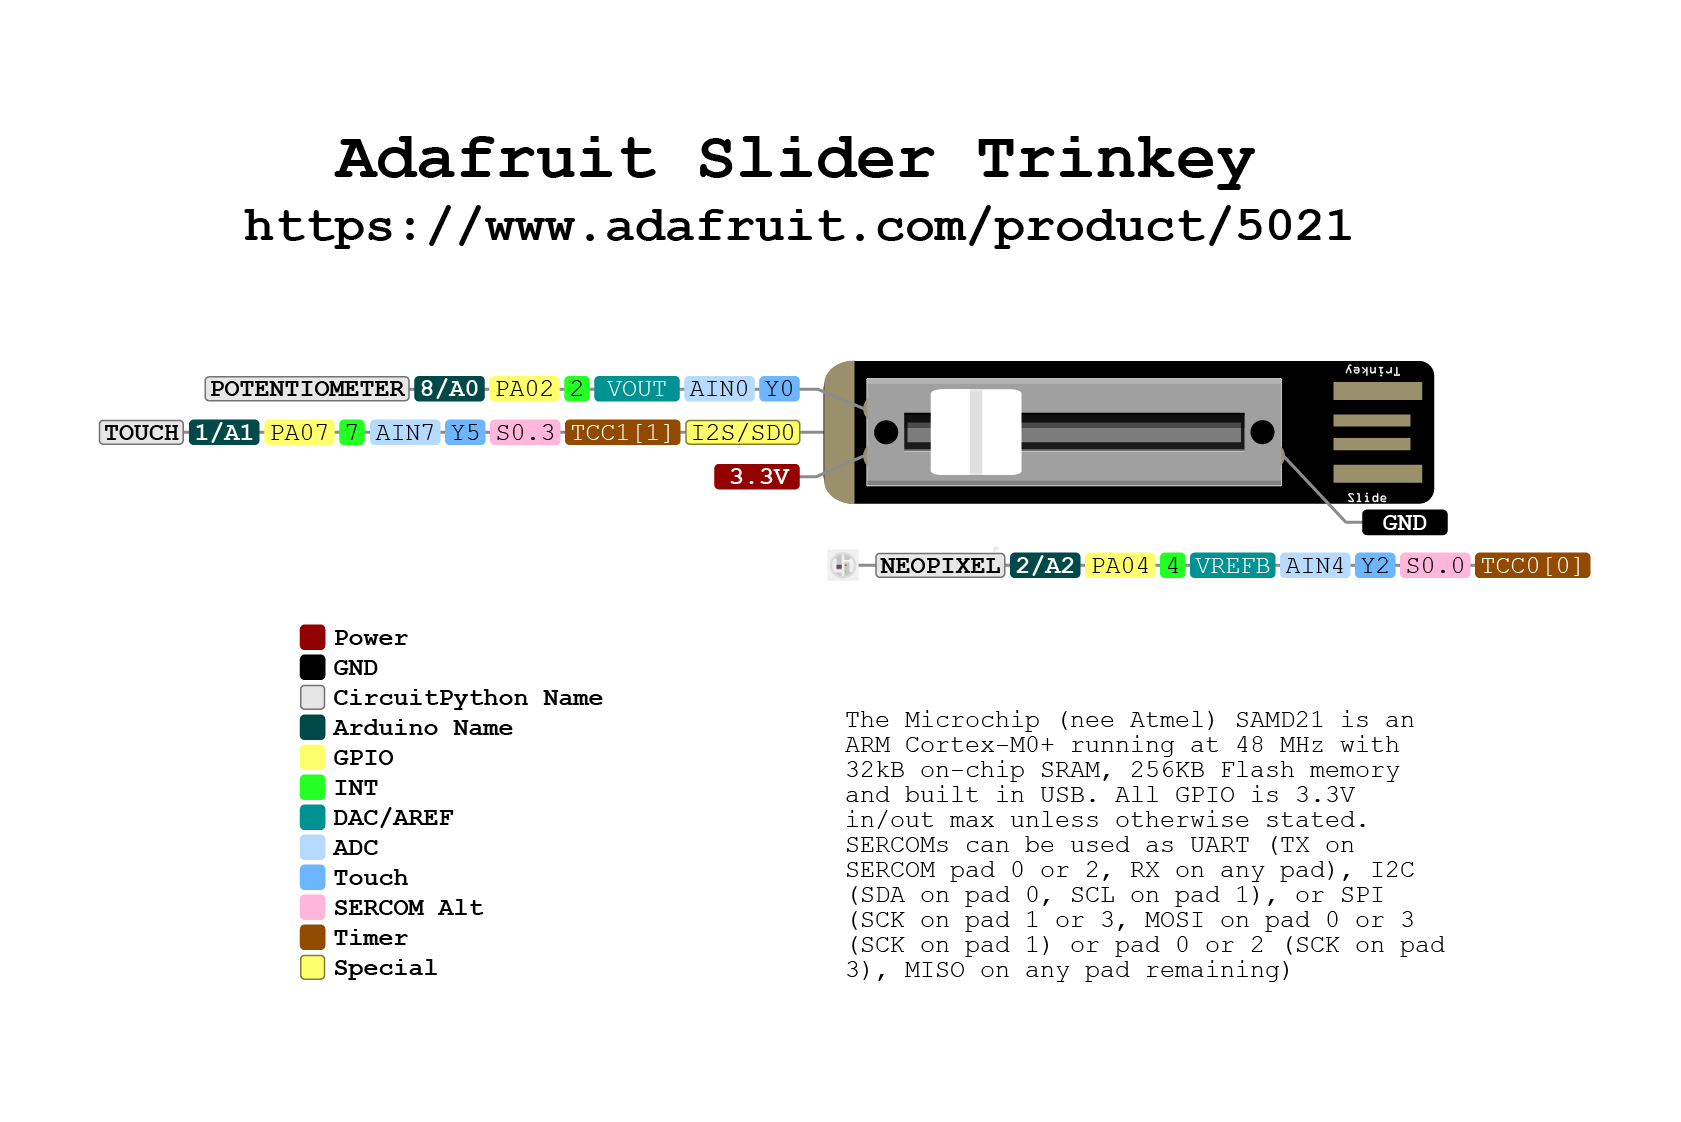 adafruit_products_Adafruit_Slider_Trinkey_Pinout.png